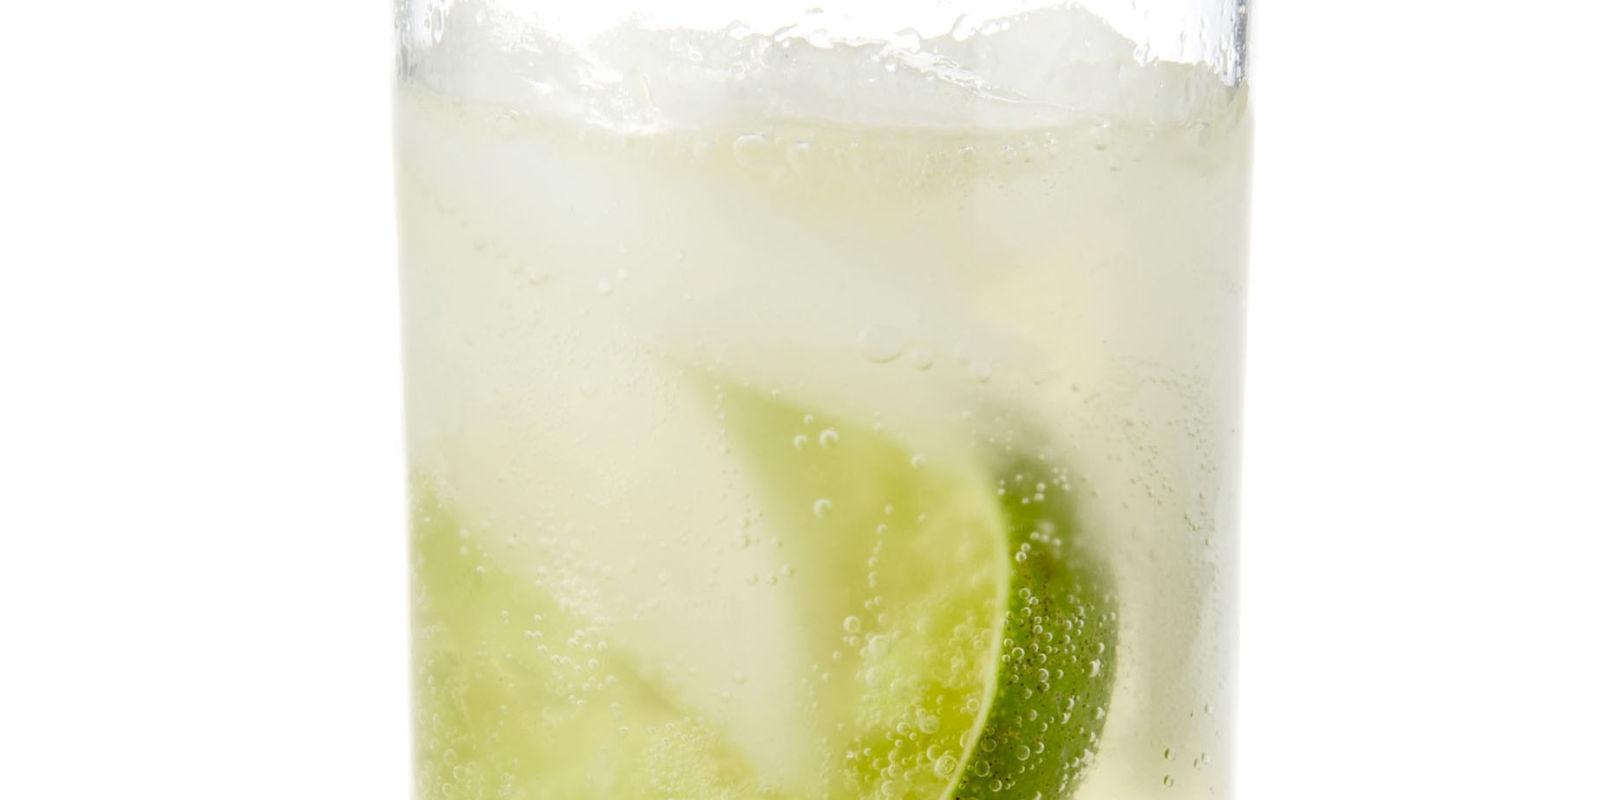 La paloma recipe best drink for cinco de mayo party for La paloma cocktail recipe